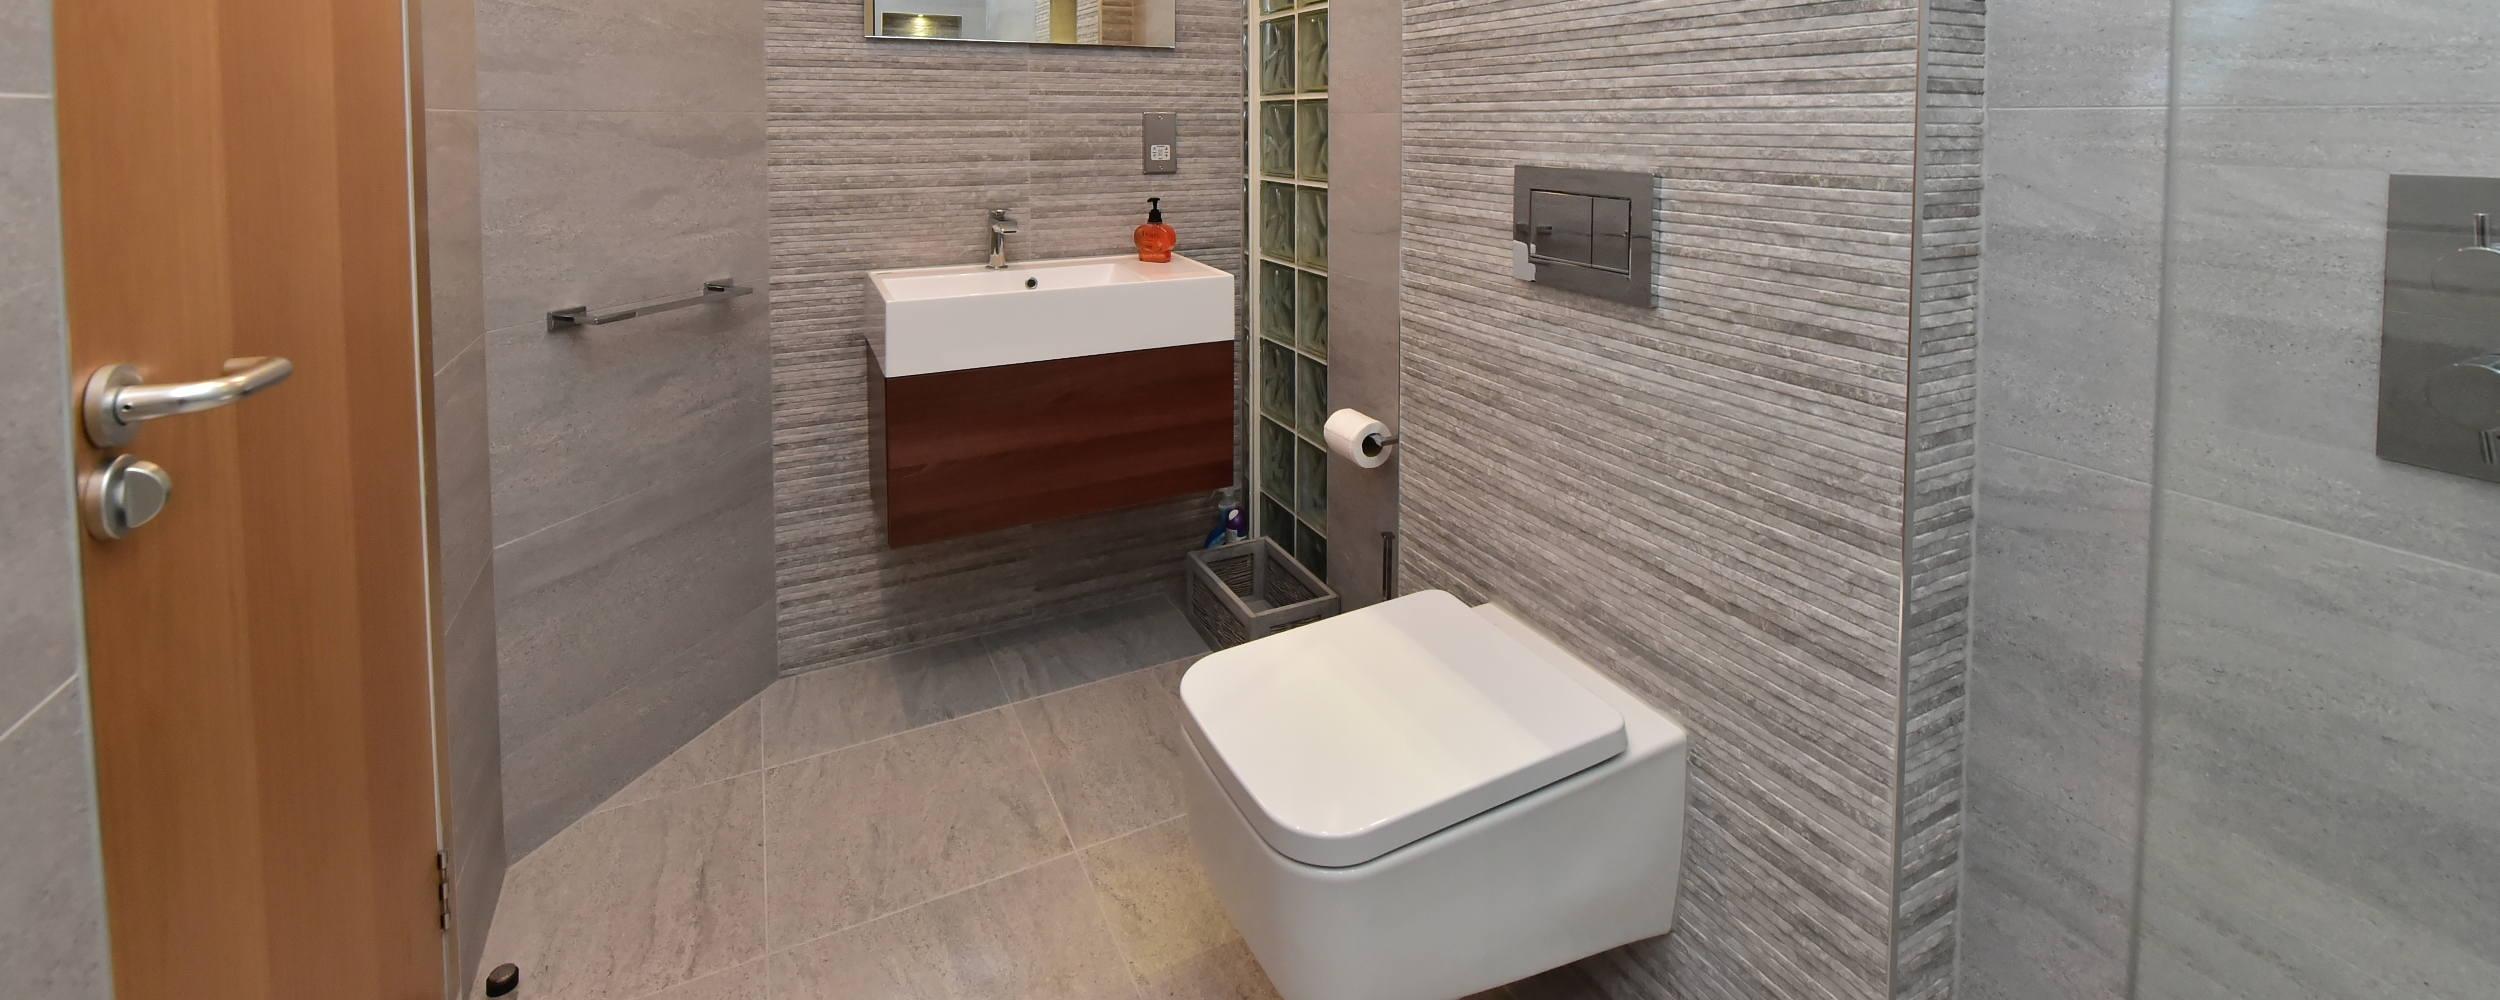 Cloakroom Design Edinburgh Ekco